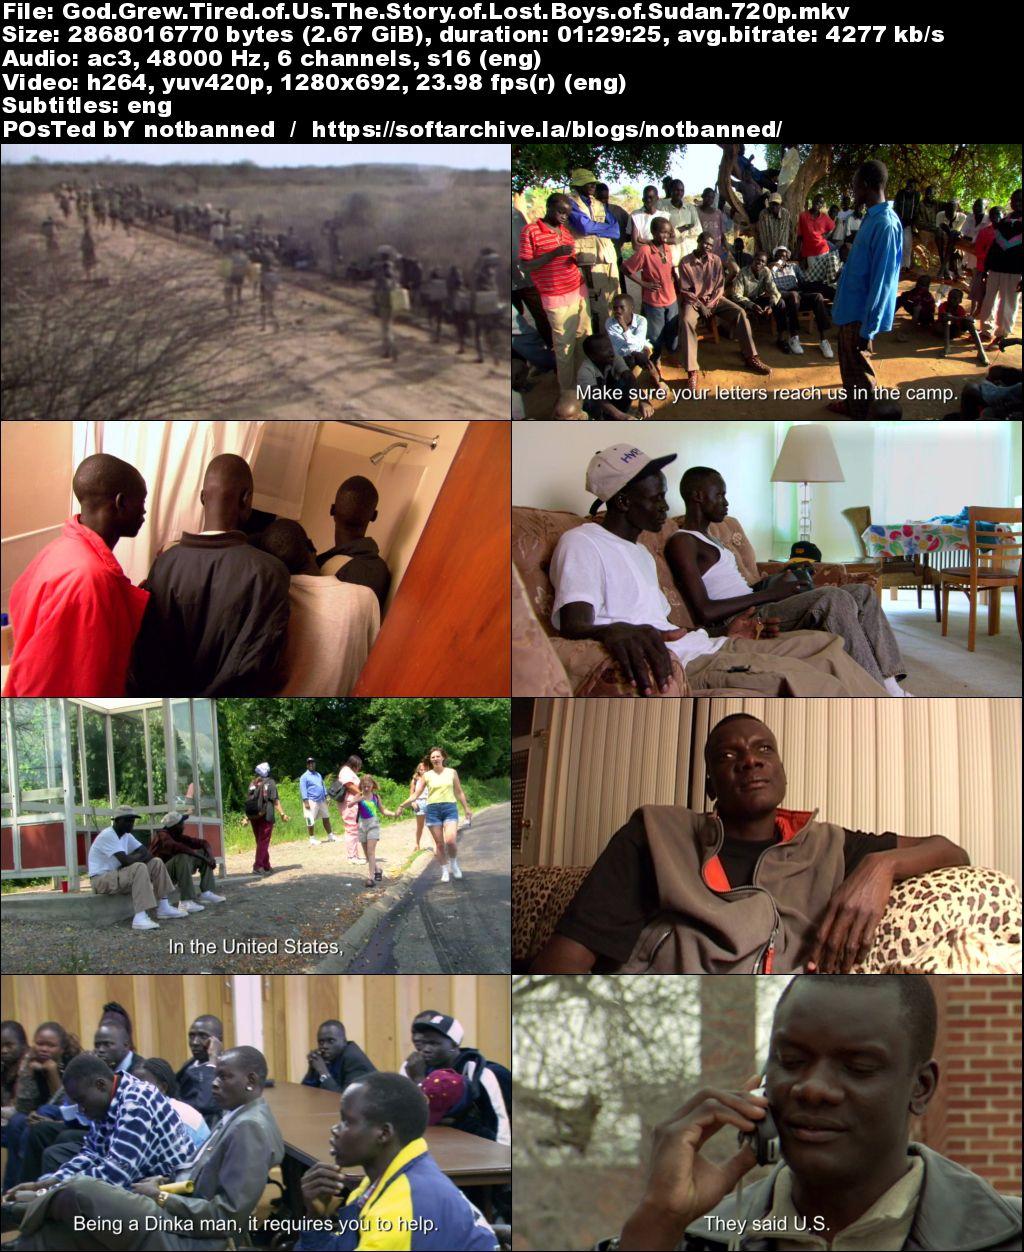 a report on the presentation and discussion with the lost boys of sudan The international crisis group is an of congo rwanda eritrea ethiopia kenya somalia south sudan sudan uganda angola madagascar zimbabwe burkina faso report.